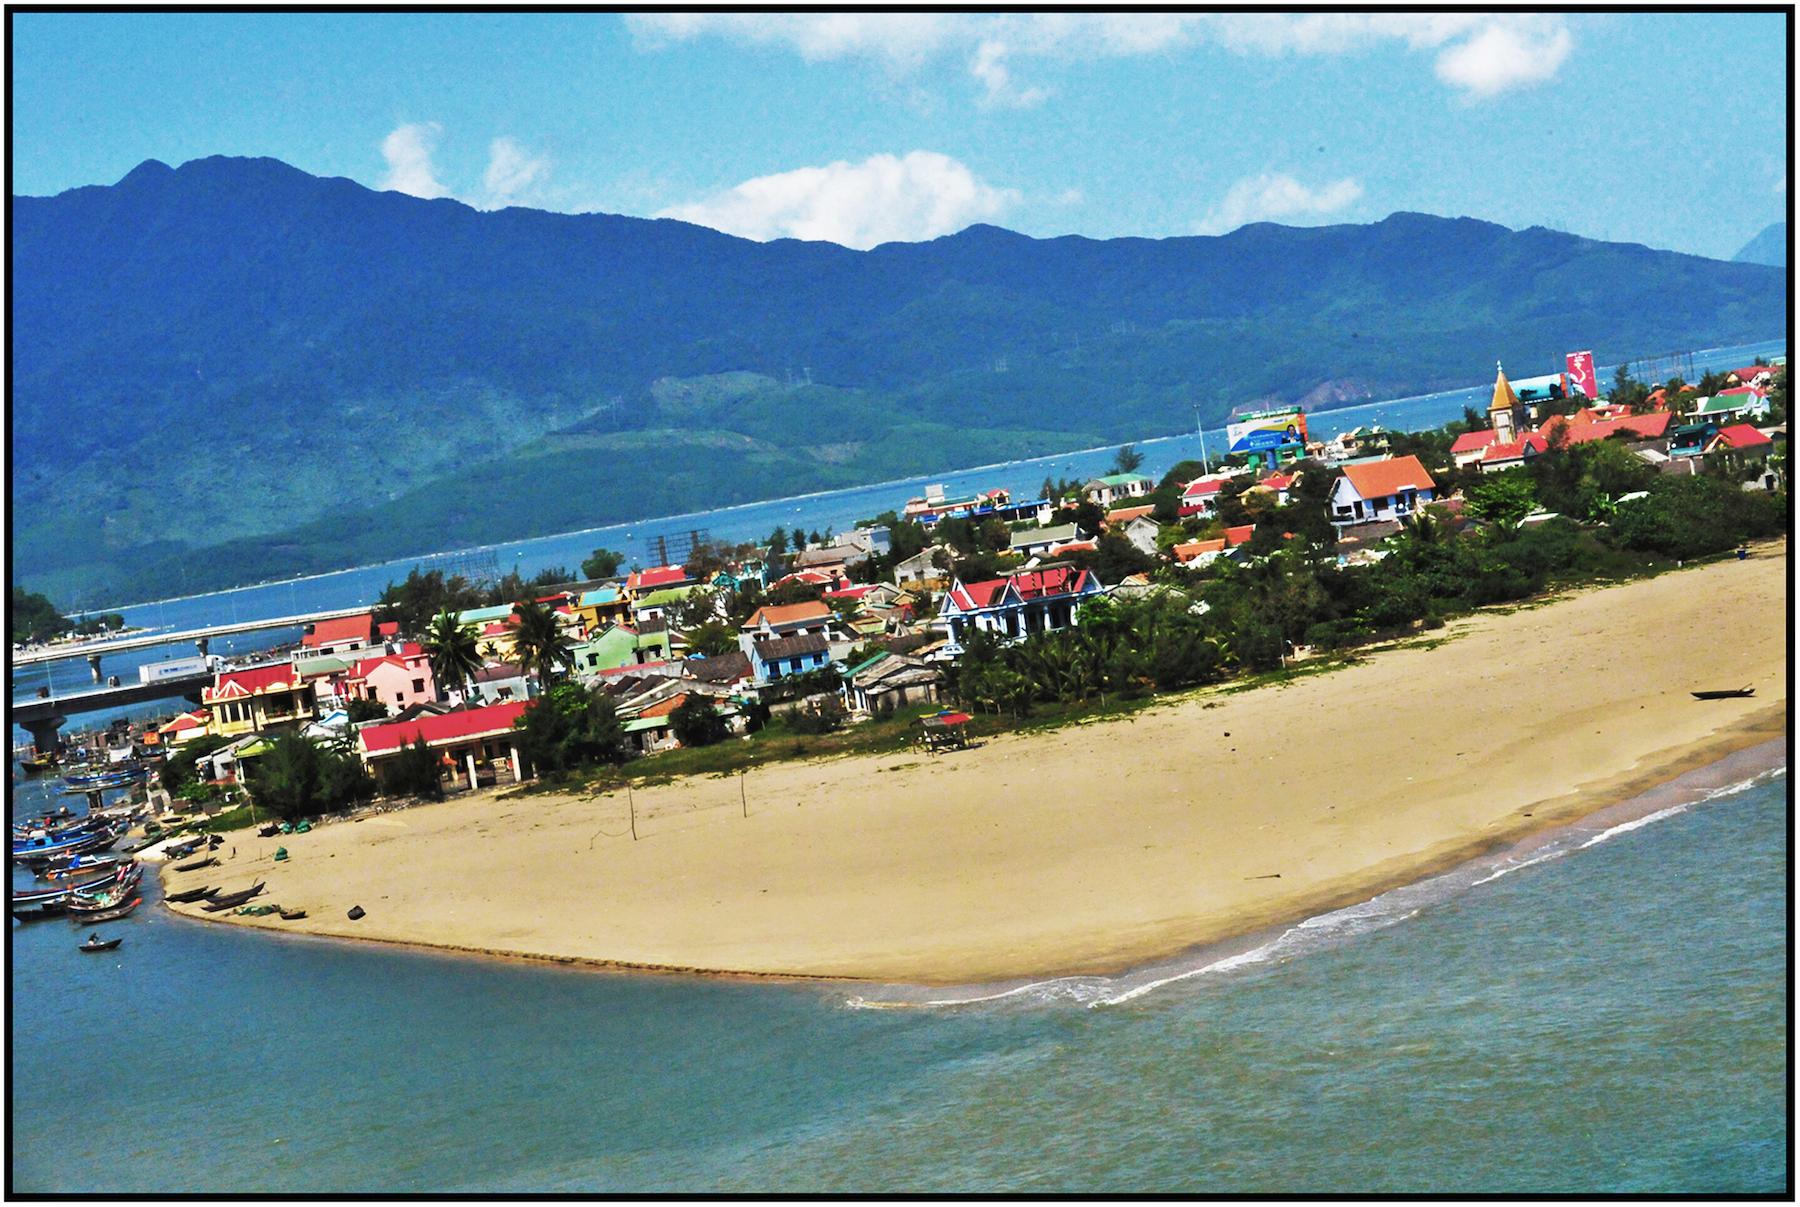 Danang, March 2015. #9318